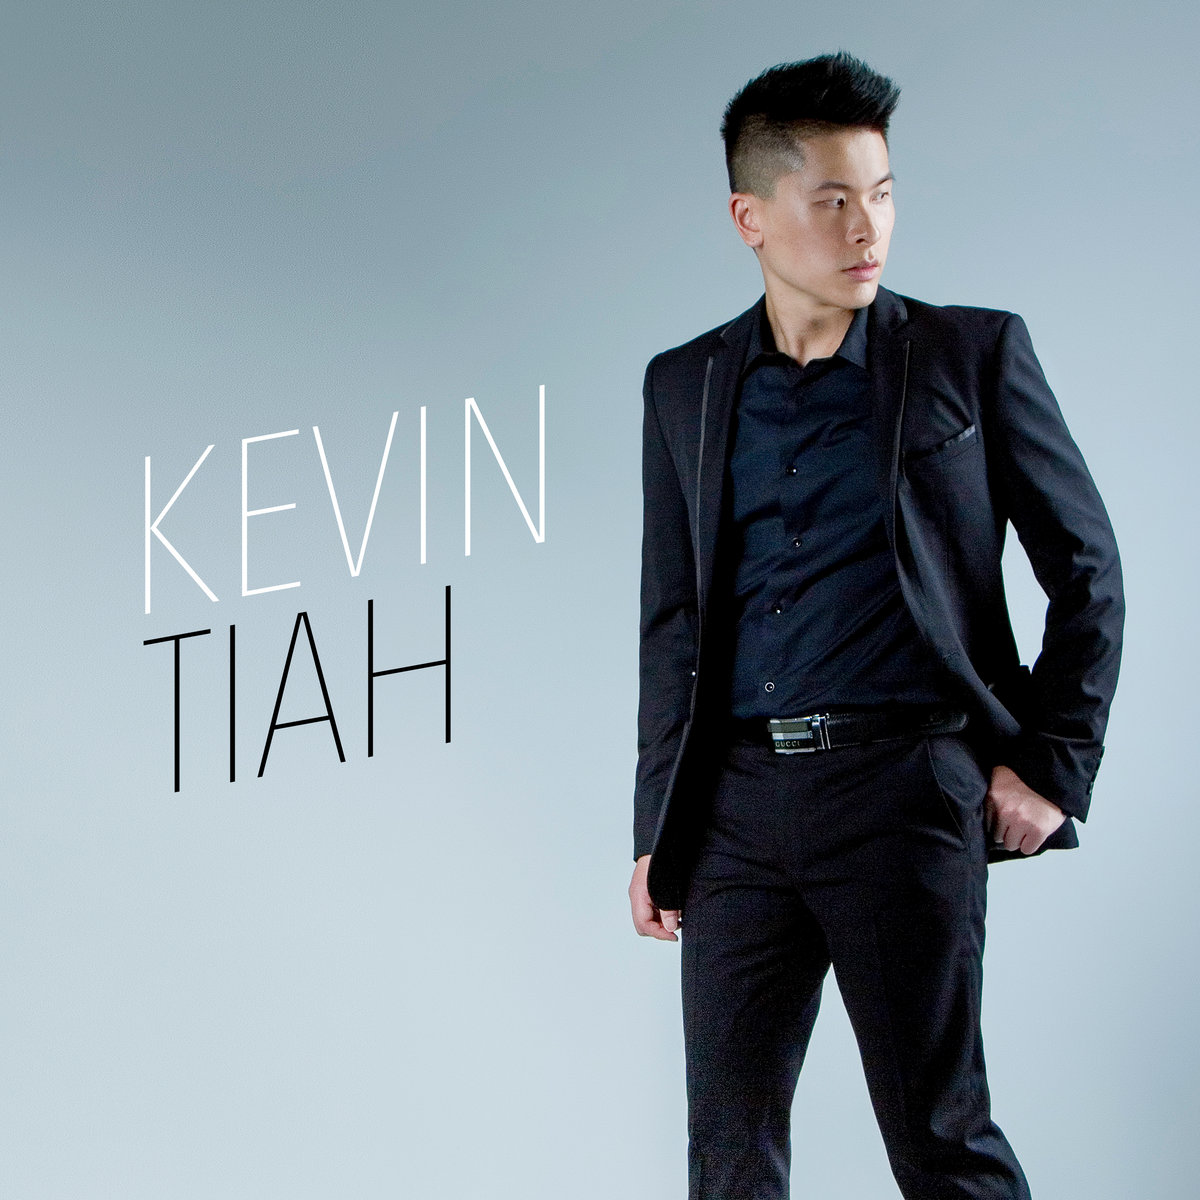 Kevin Tiah - Kevin Tiah (2018)